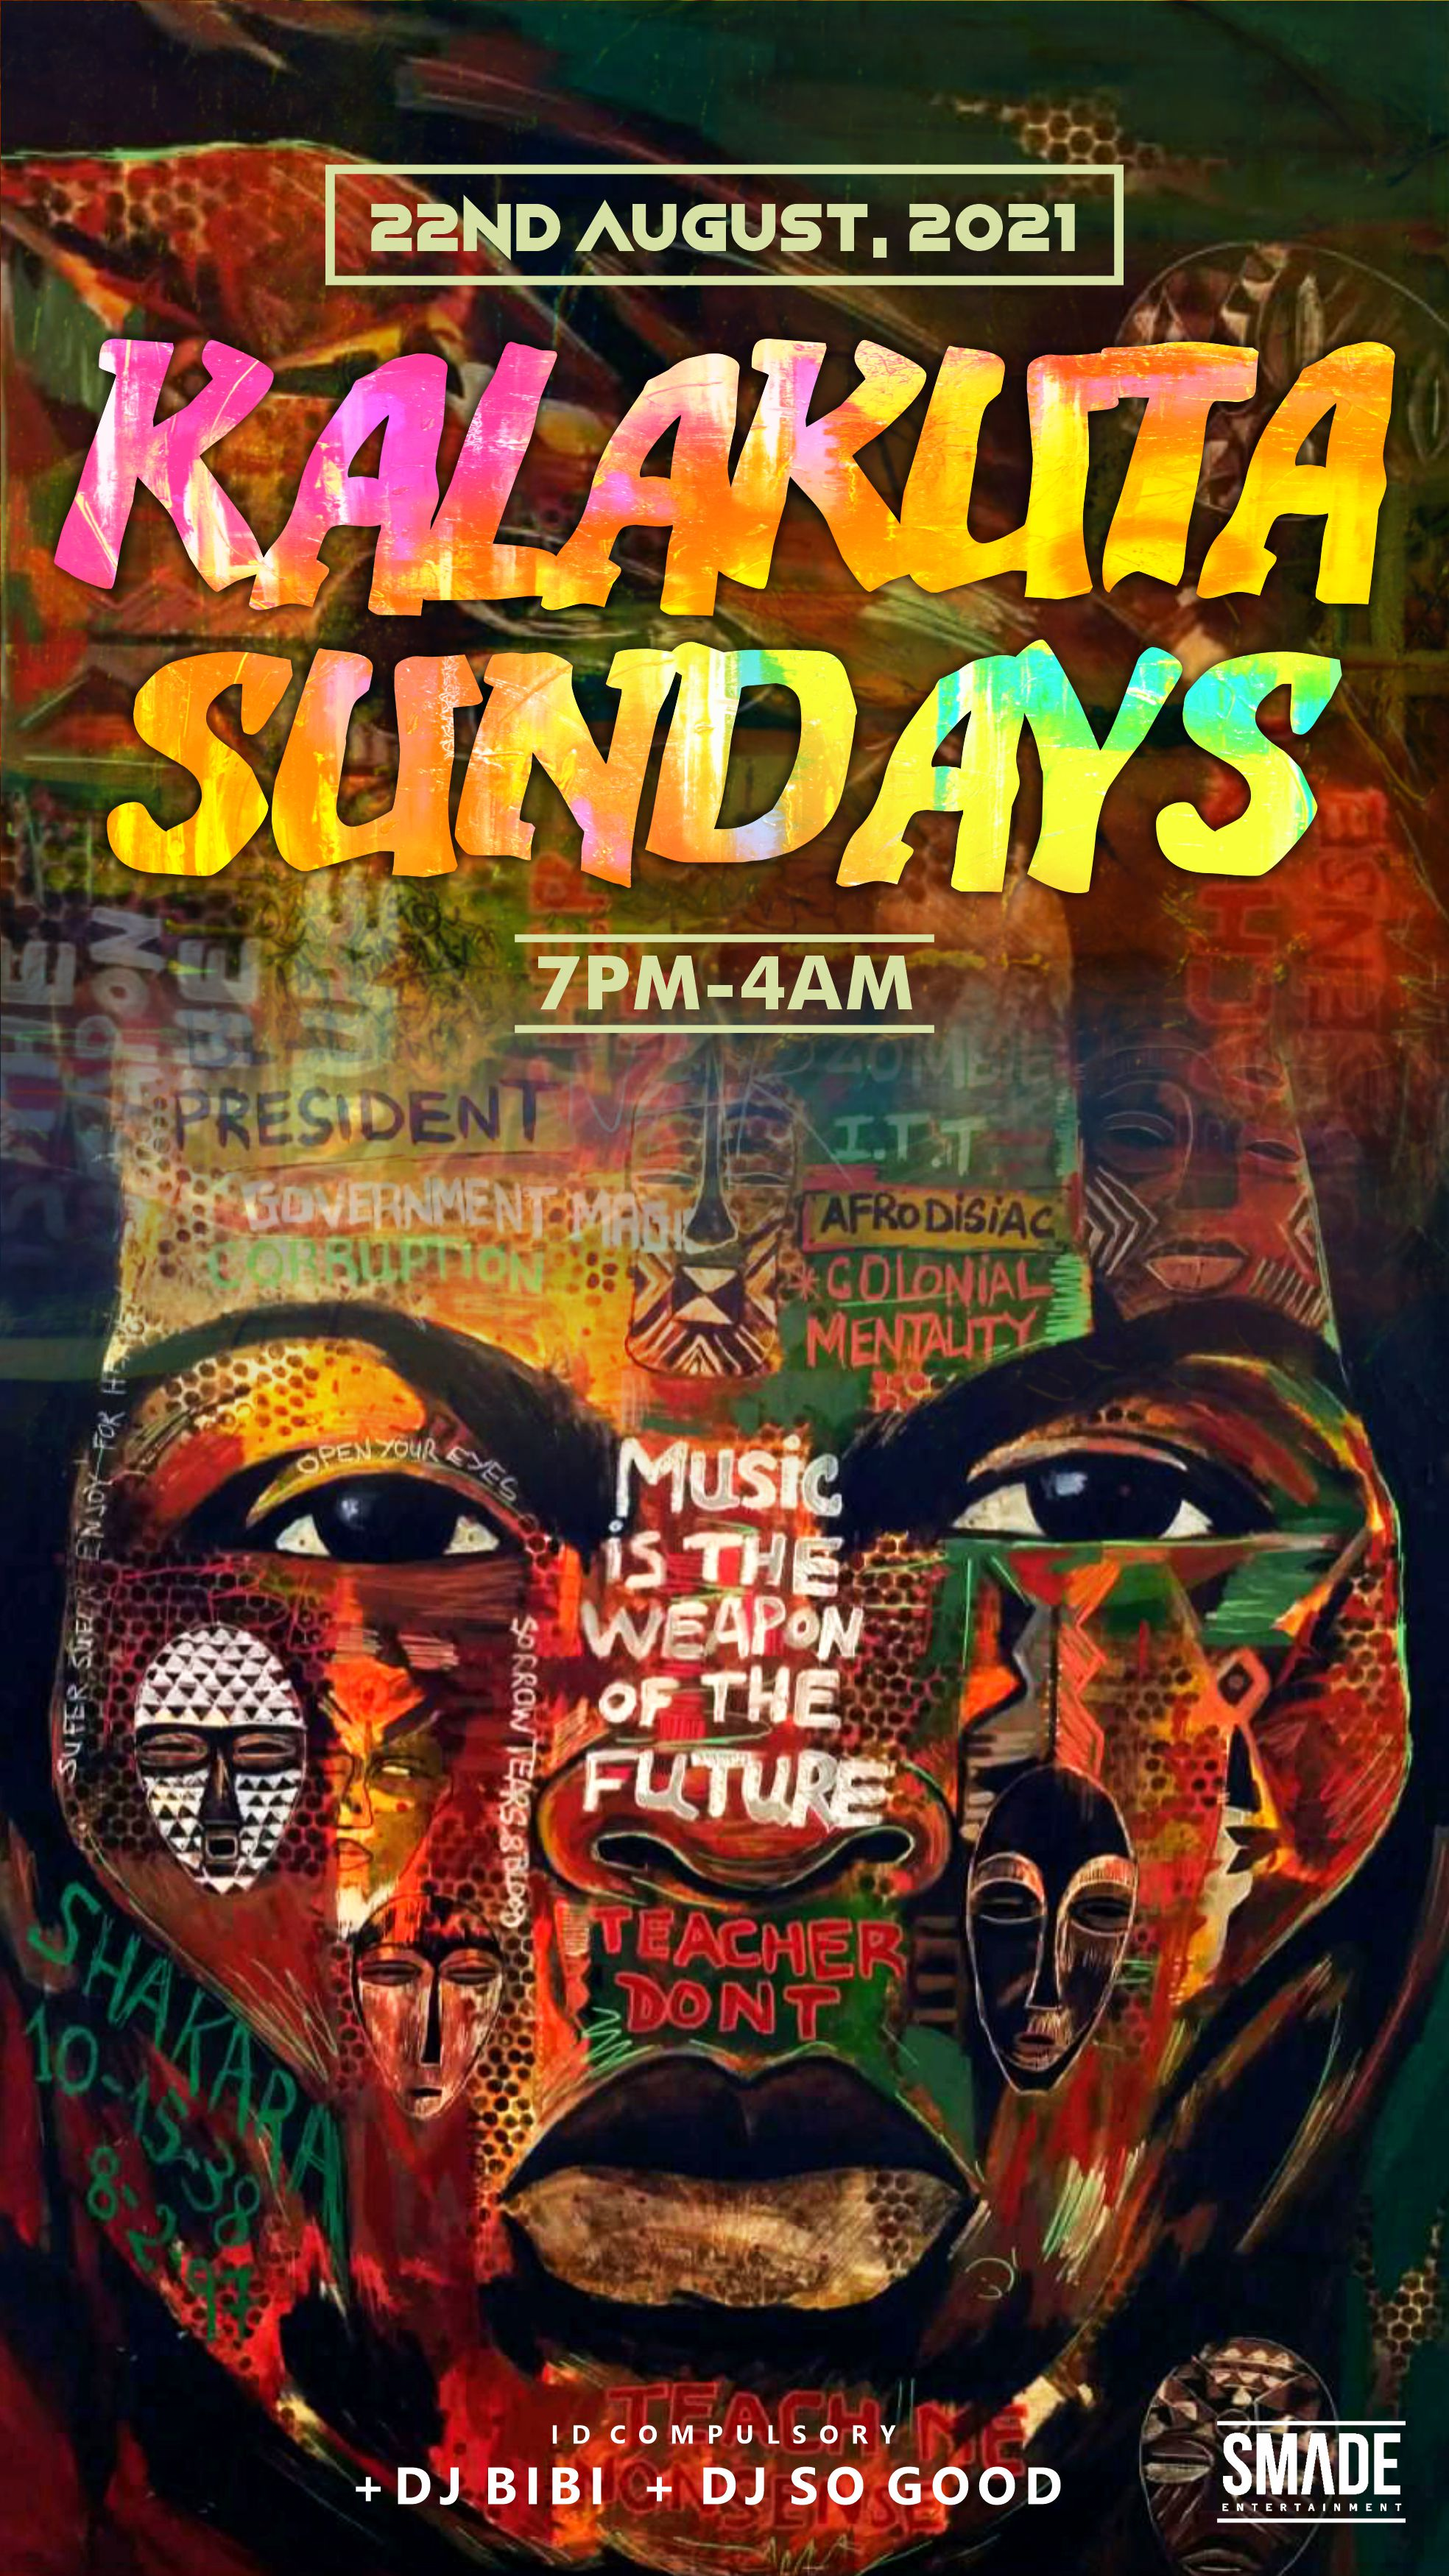 Kalakuta Sundays AUG 29 - #BankHolidaySpecial